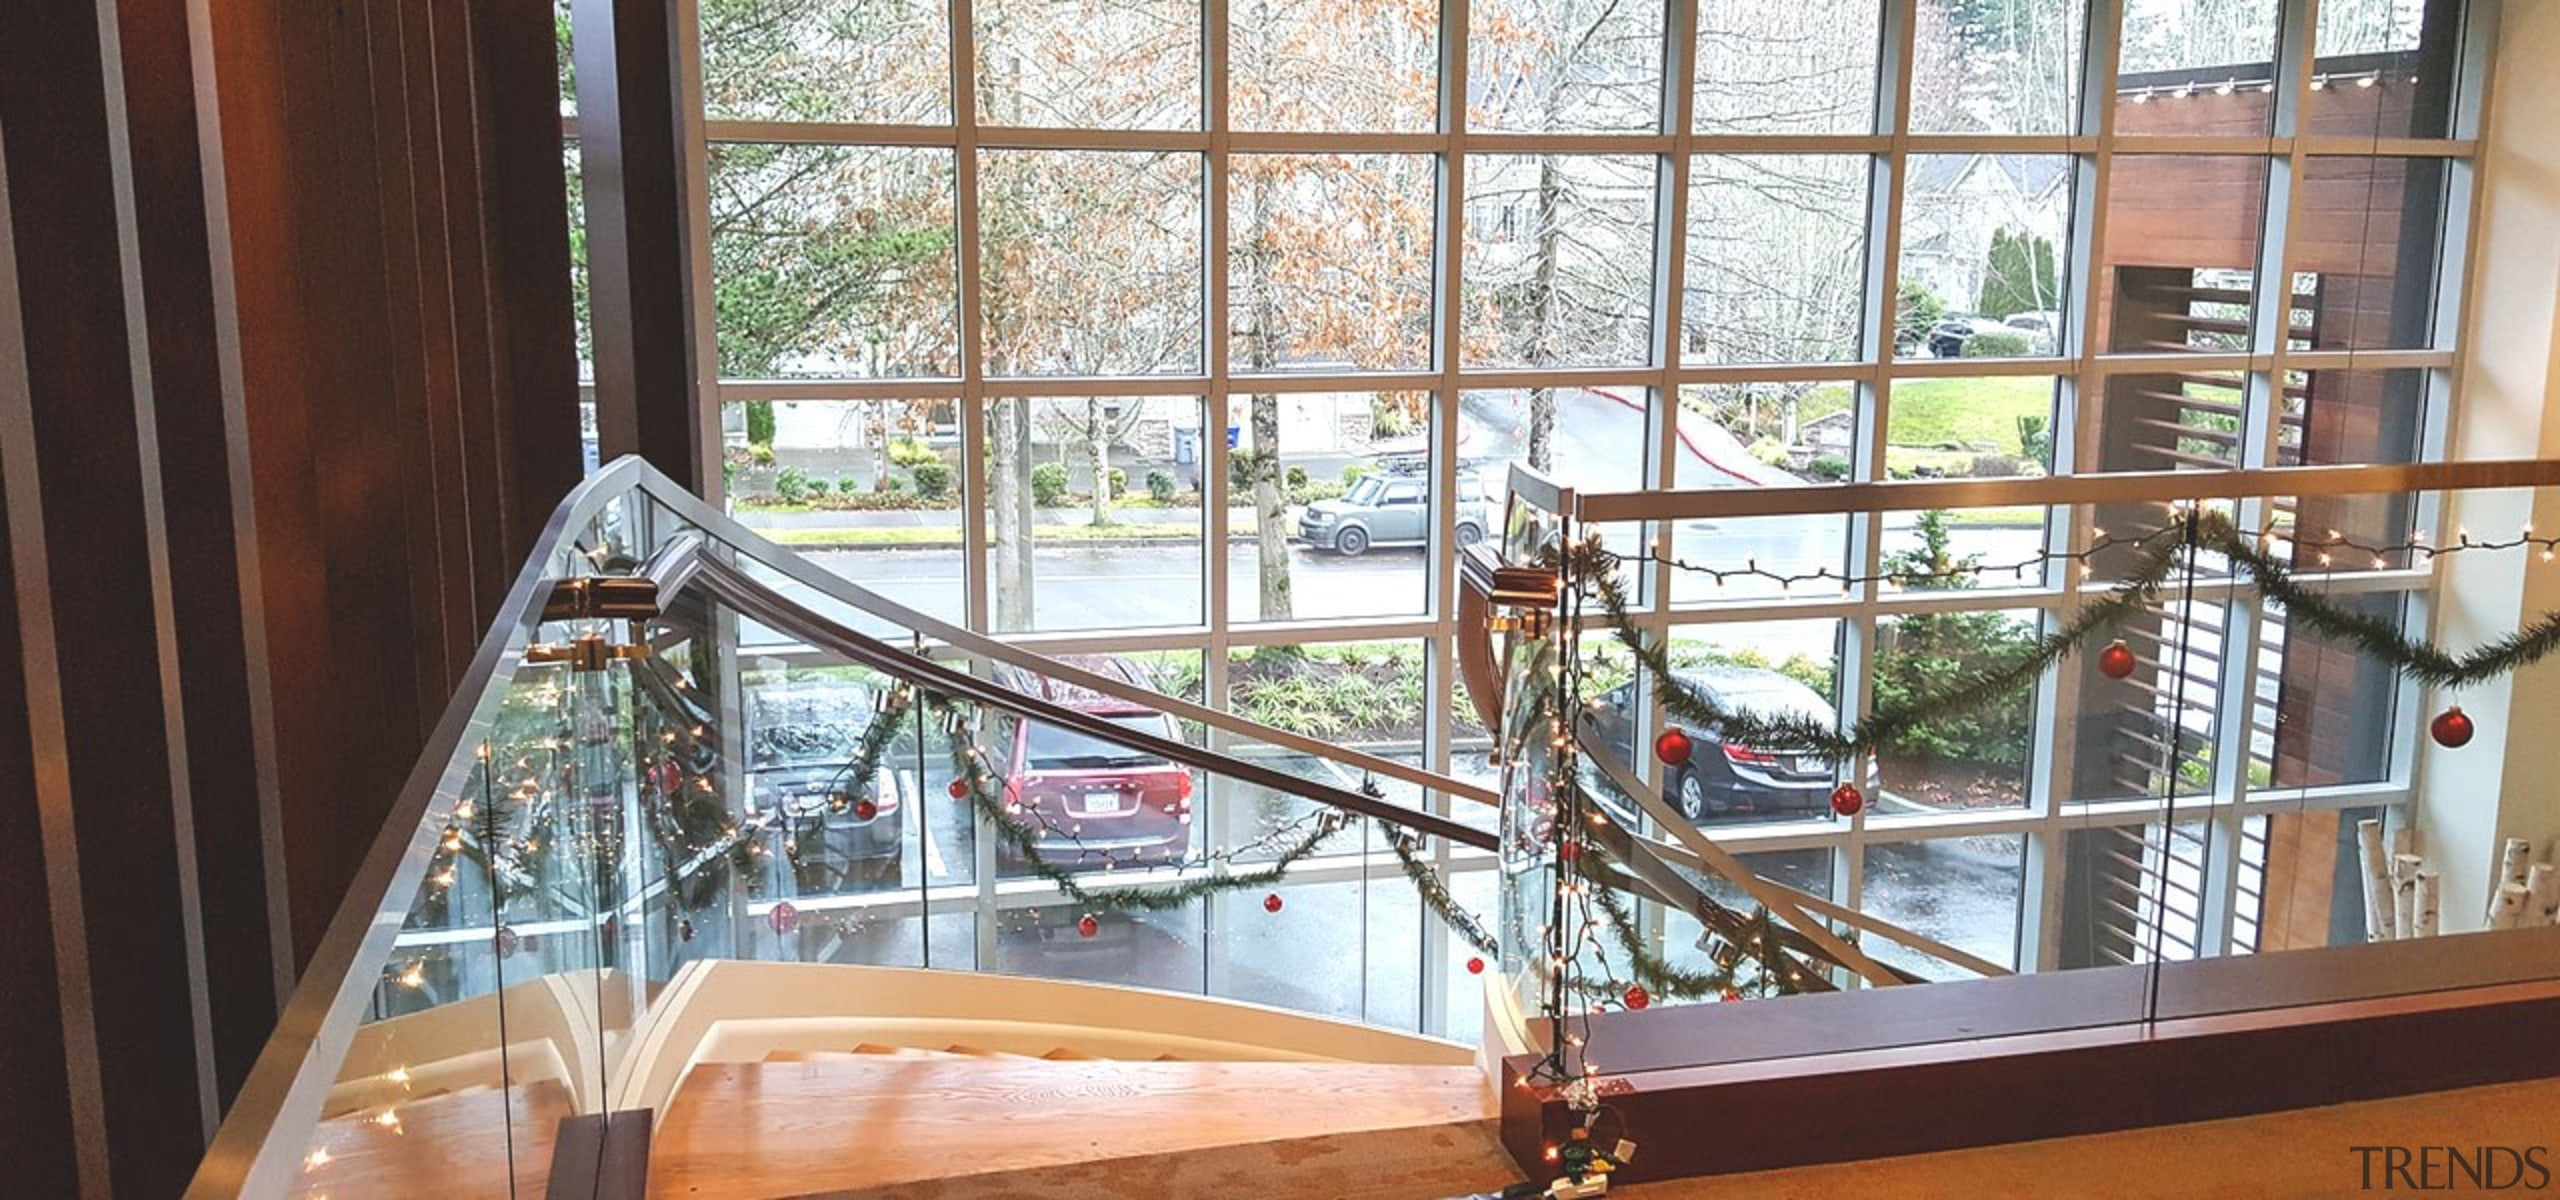 Aegis Living 04 - architecture | daylighting | architecture, daylighting, glass, handrail, room, window, wood, white